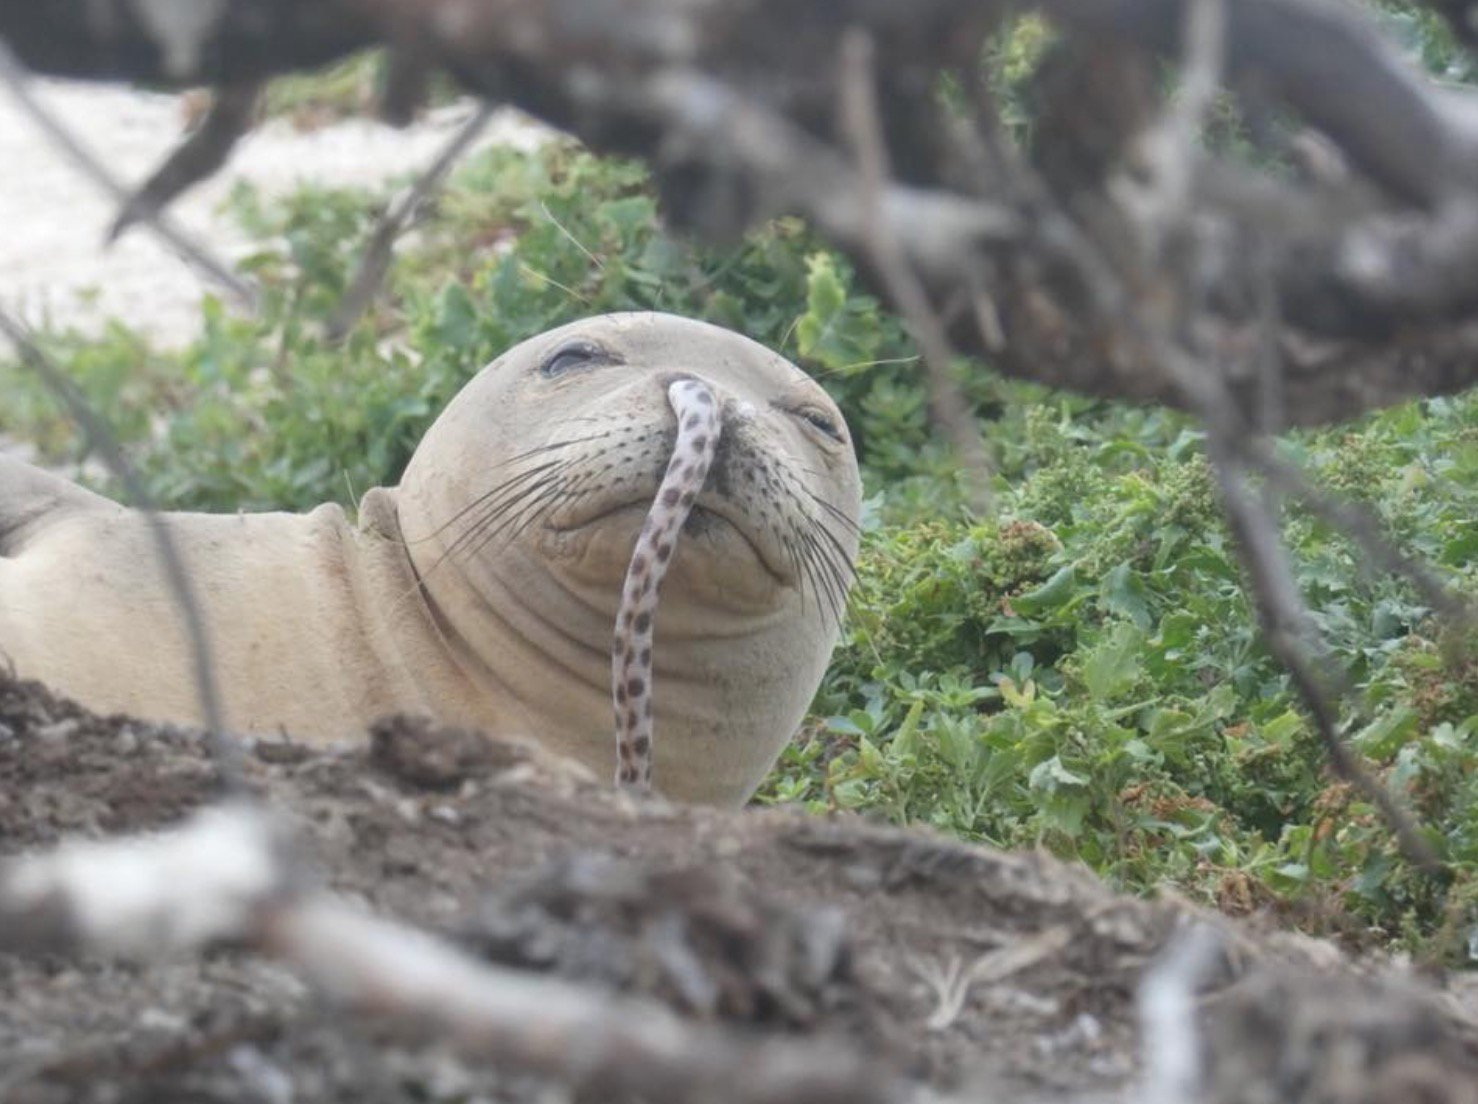 Dumbass seal gets an eel stuck in his nose https://t.co/qIlIXiGL6u https://t.co/P9MLNAGkWE